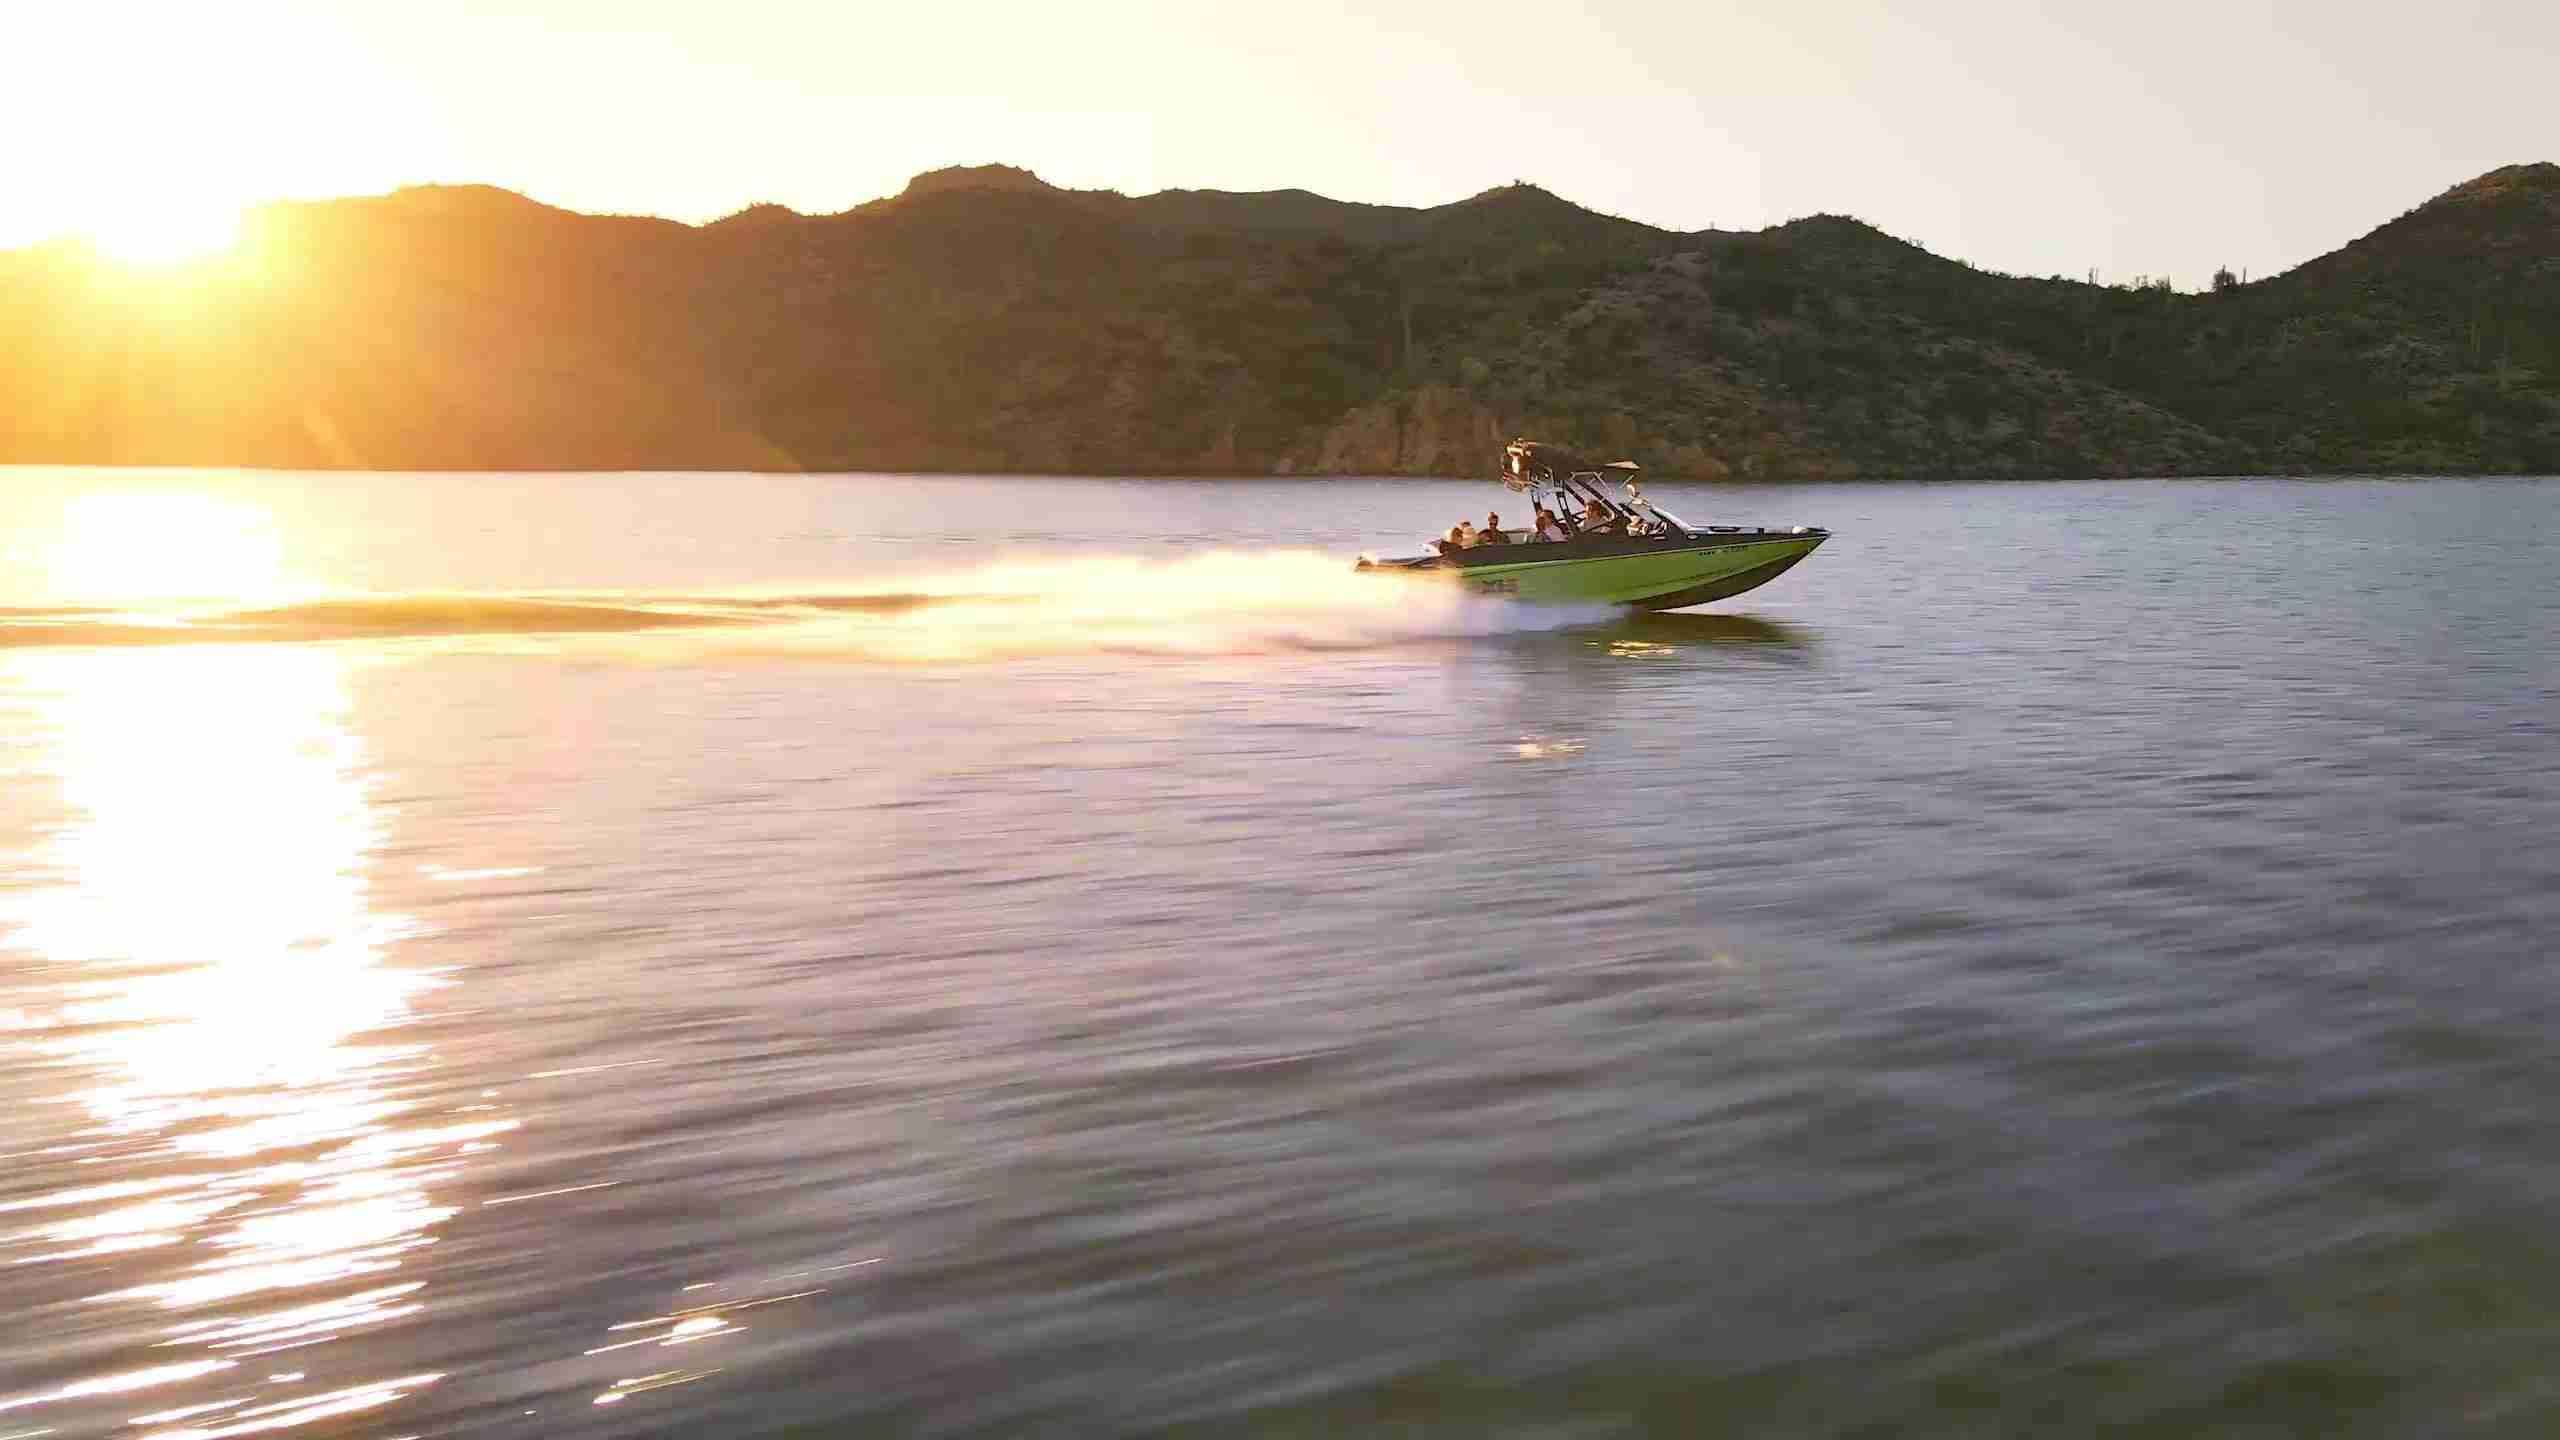 dji mavic drone ocean shot